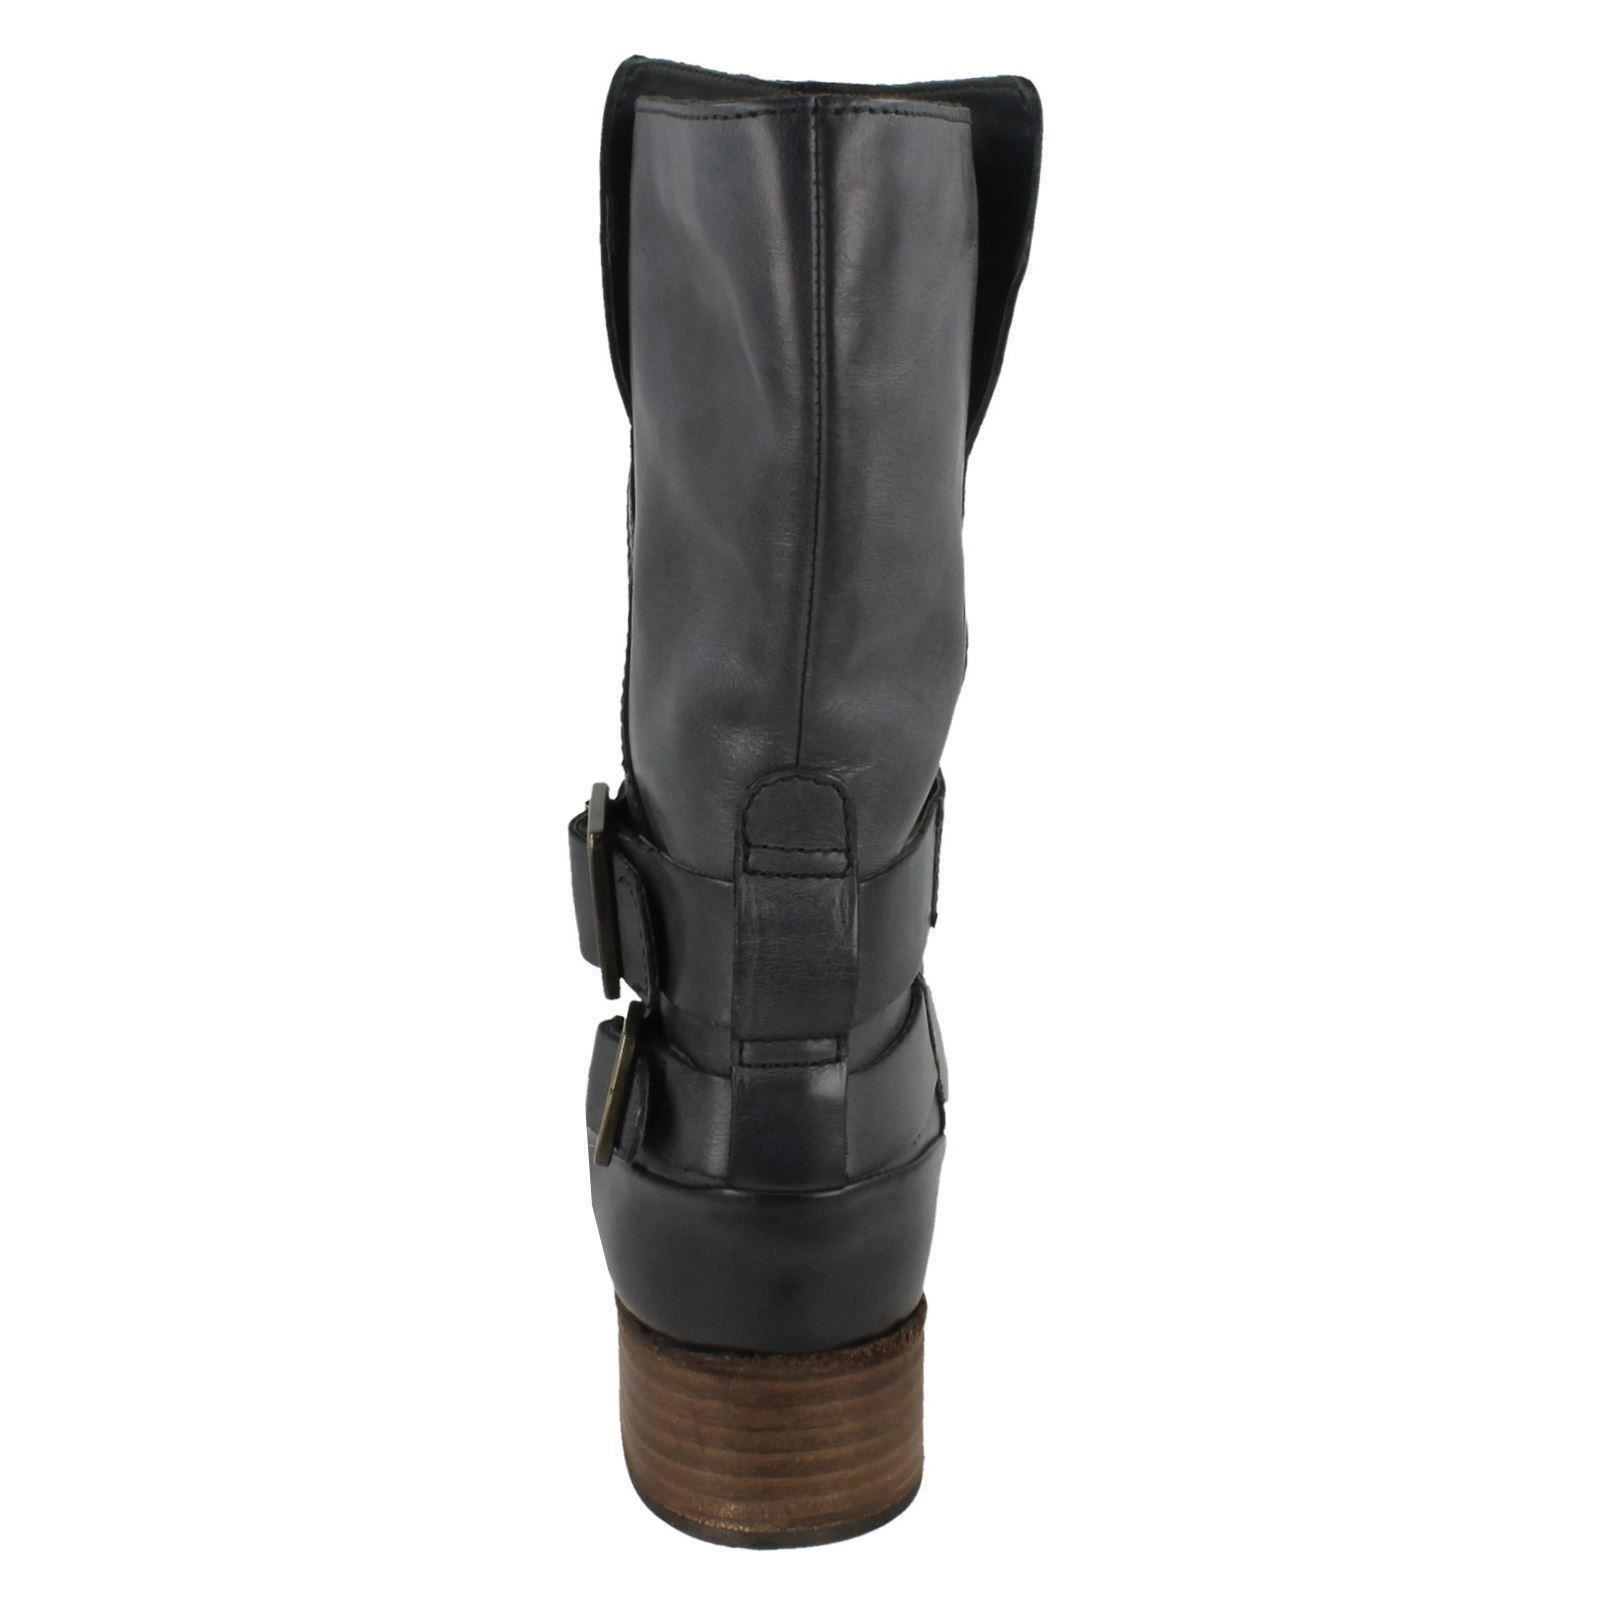 Trim Monica Soul grey With Ladies Strap Boots Grey Clarks Buckle Dark qPxpXF66wc